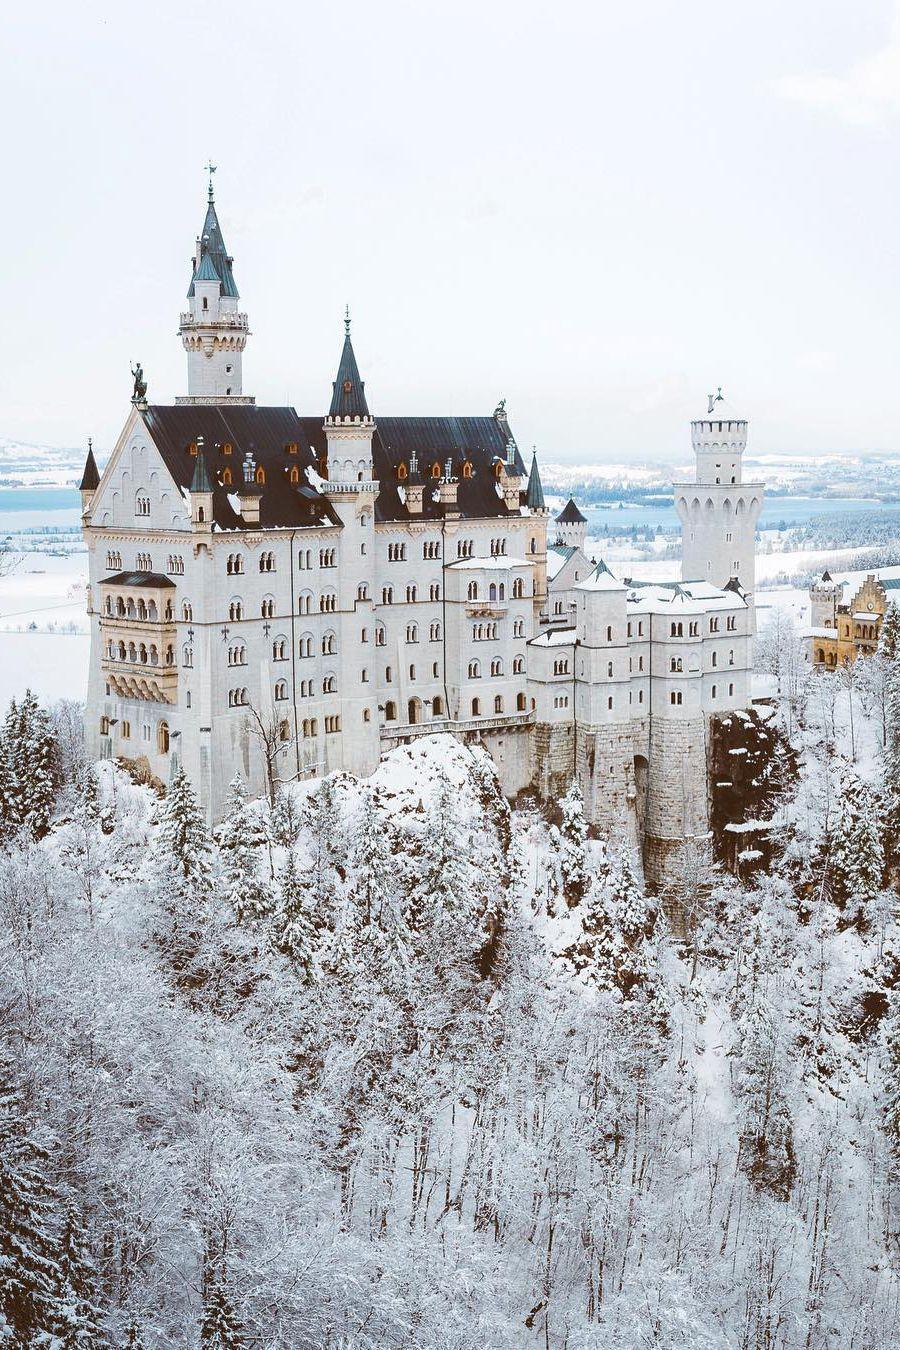 Perpetuallychristmas Banshy Neuschwanstein Castle Asyraf Christmas Posts All Year New Lugares Hermosos Castillo De Neuschwanstein Lugares Preciosos